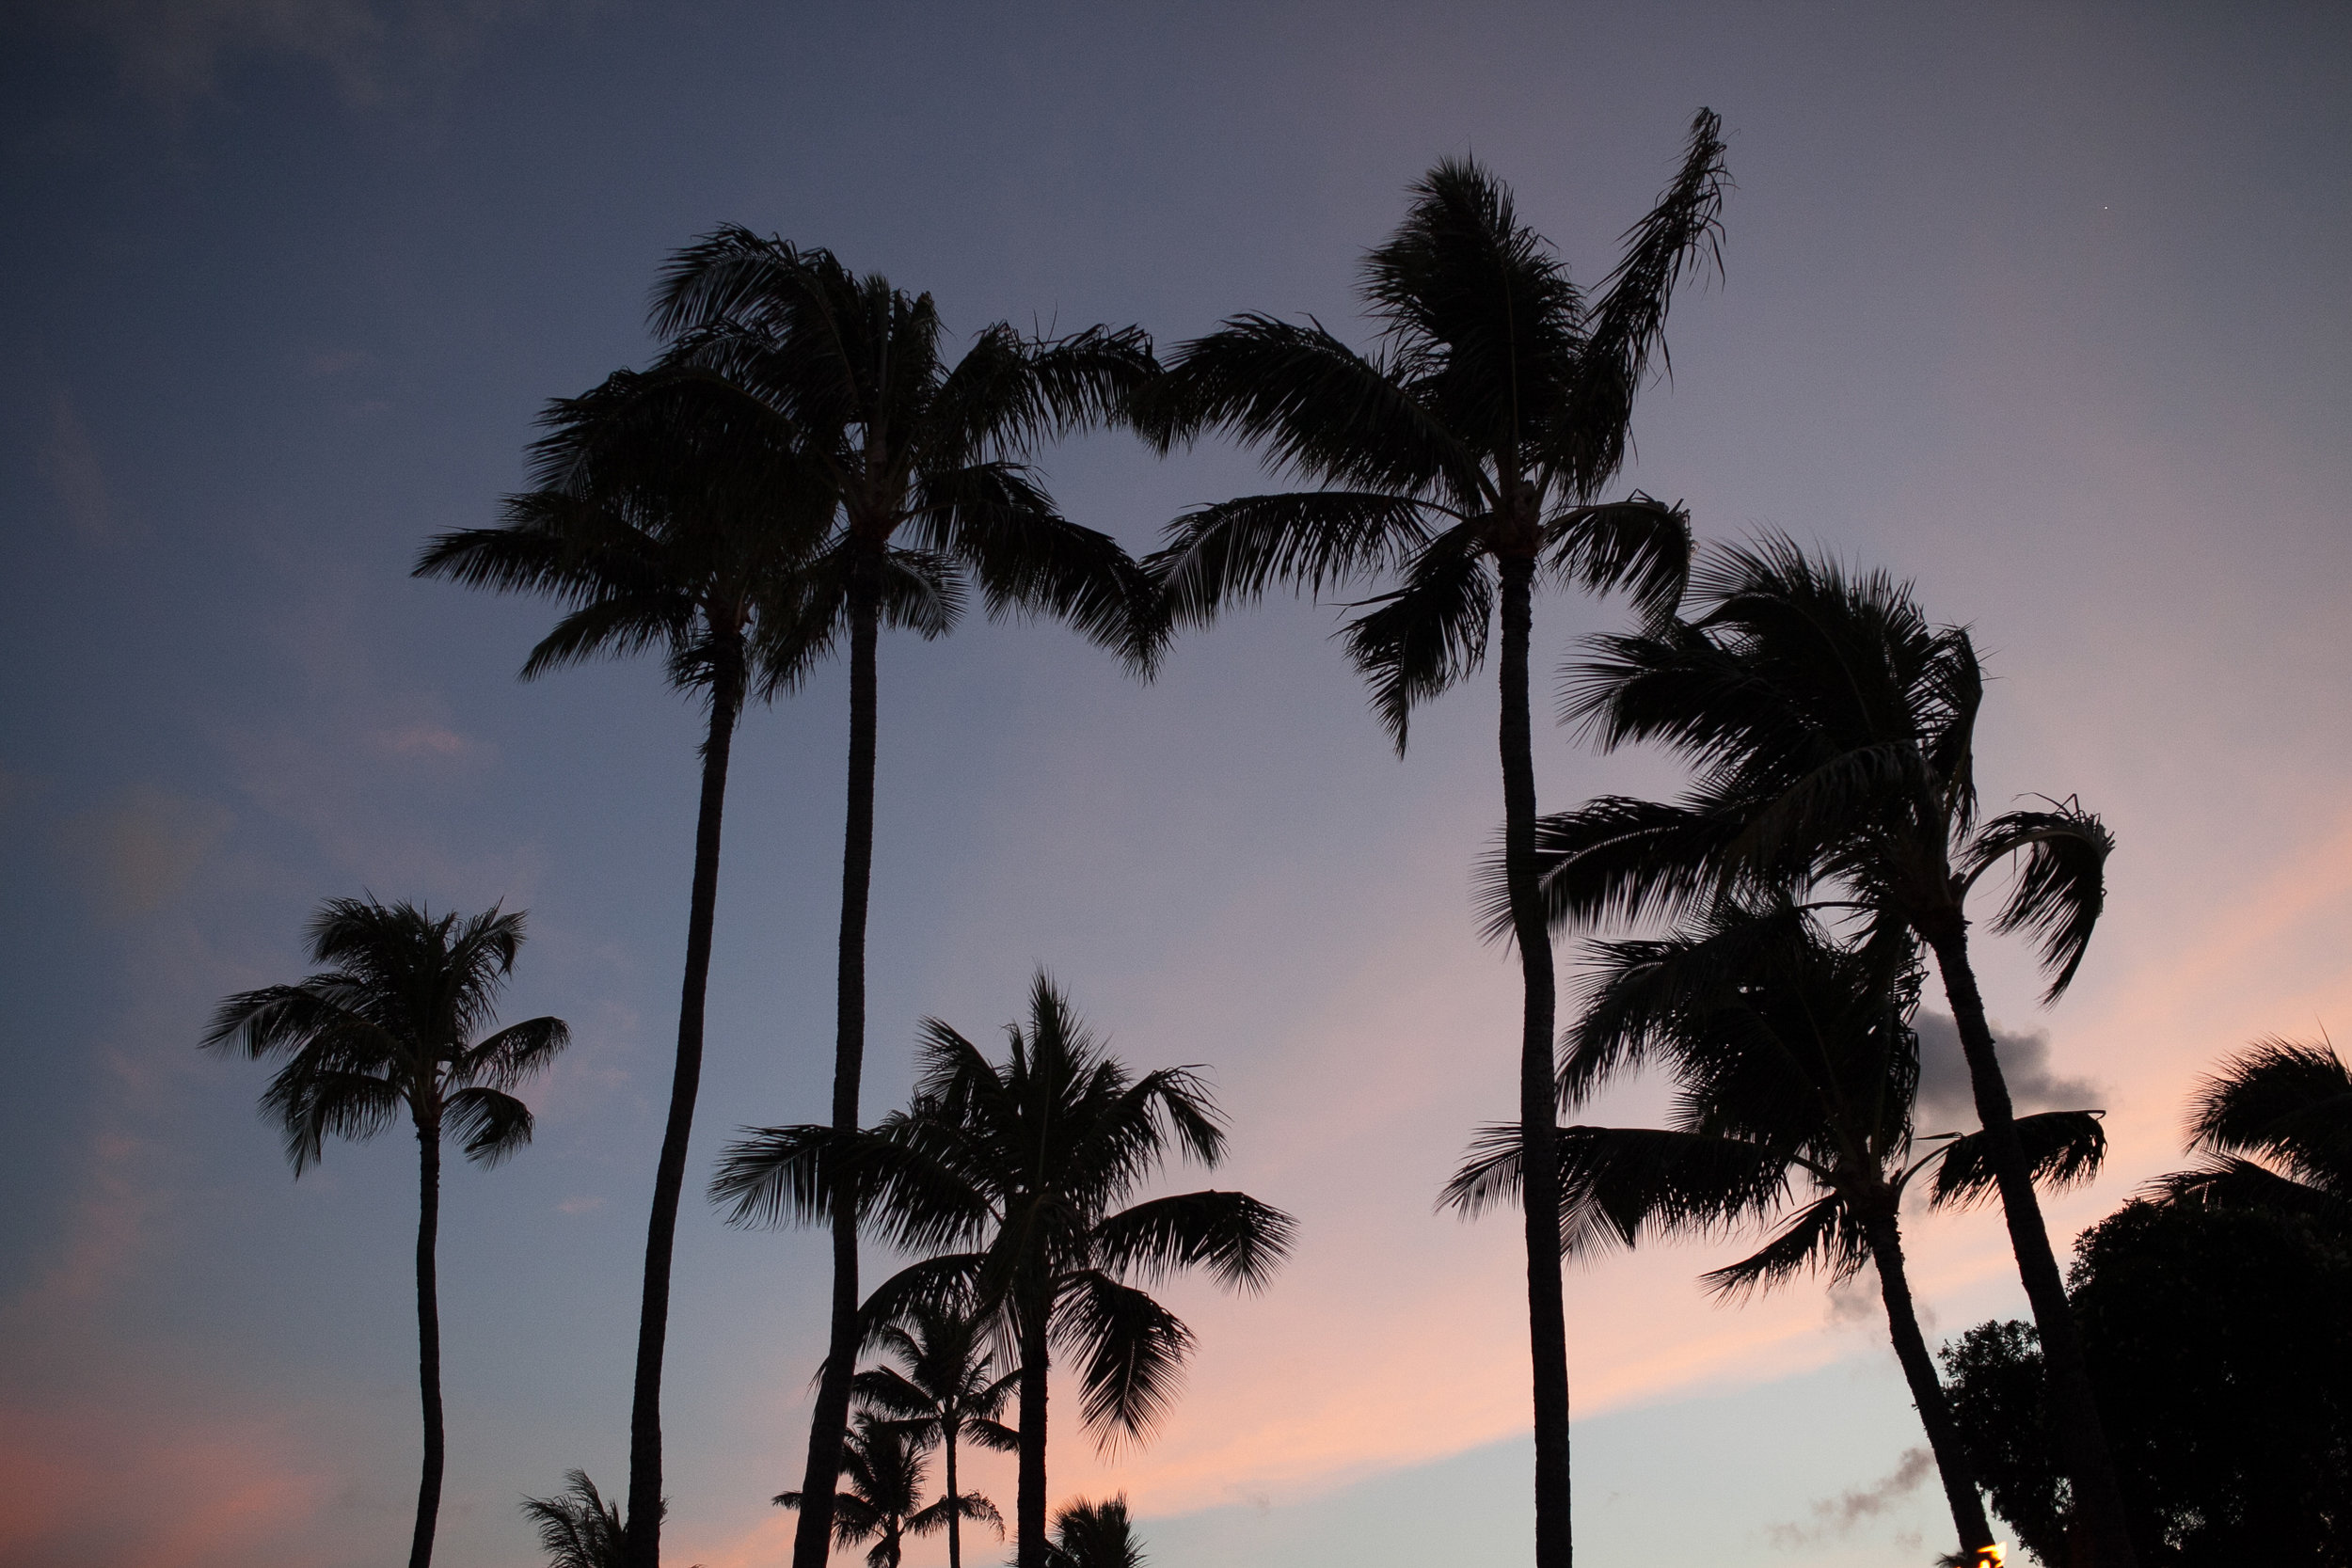 004Travel_Adventure_Photography_Outlive_Creative_Hawaii.jpg